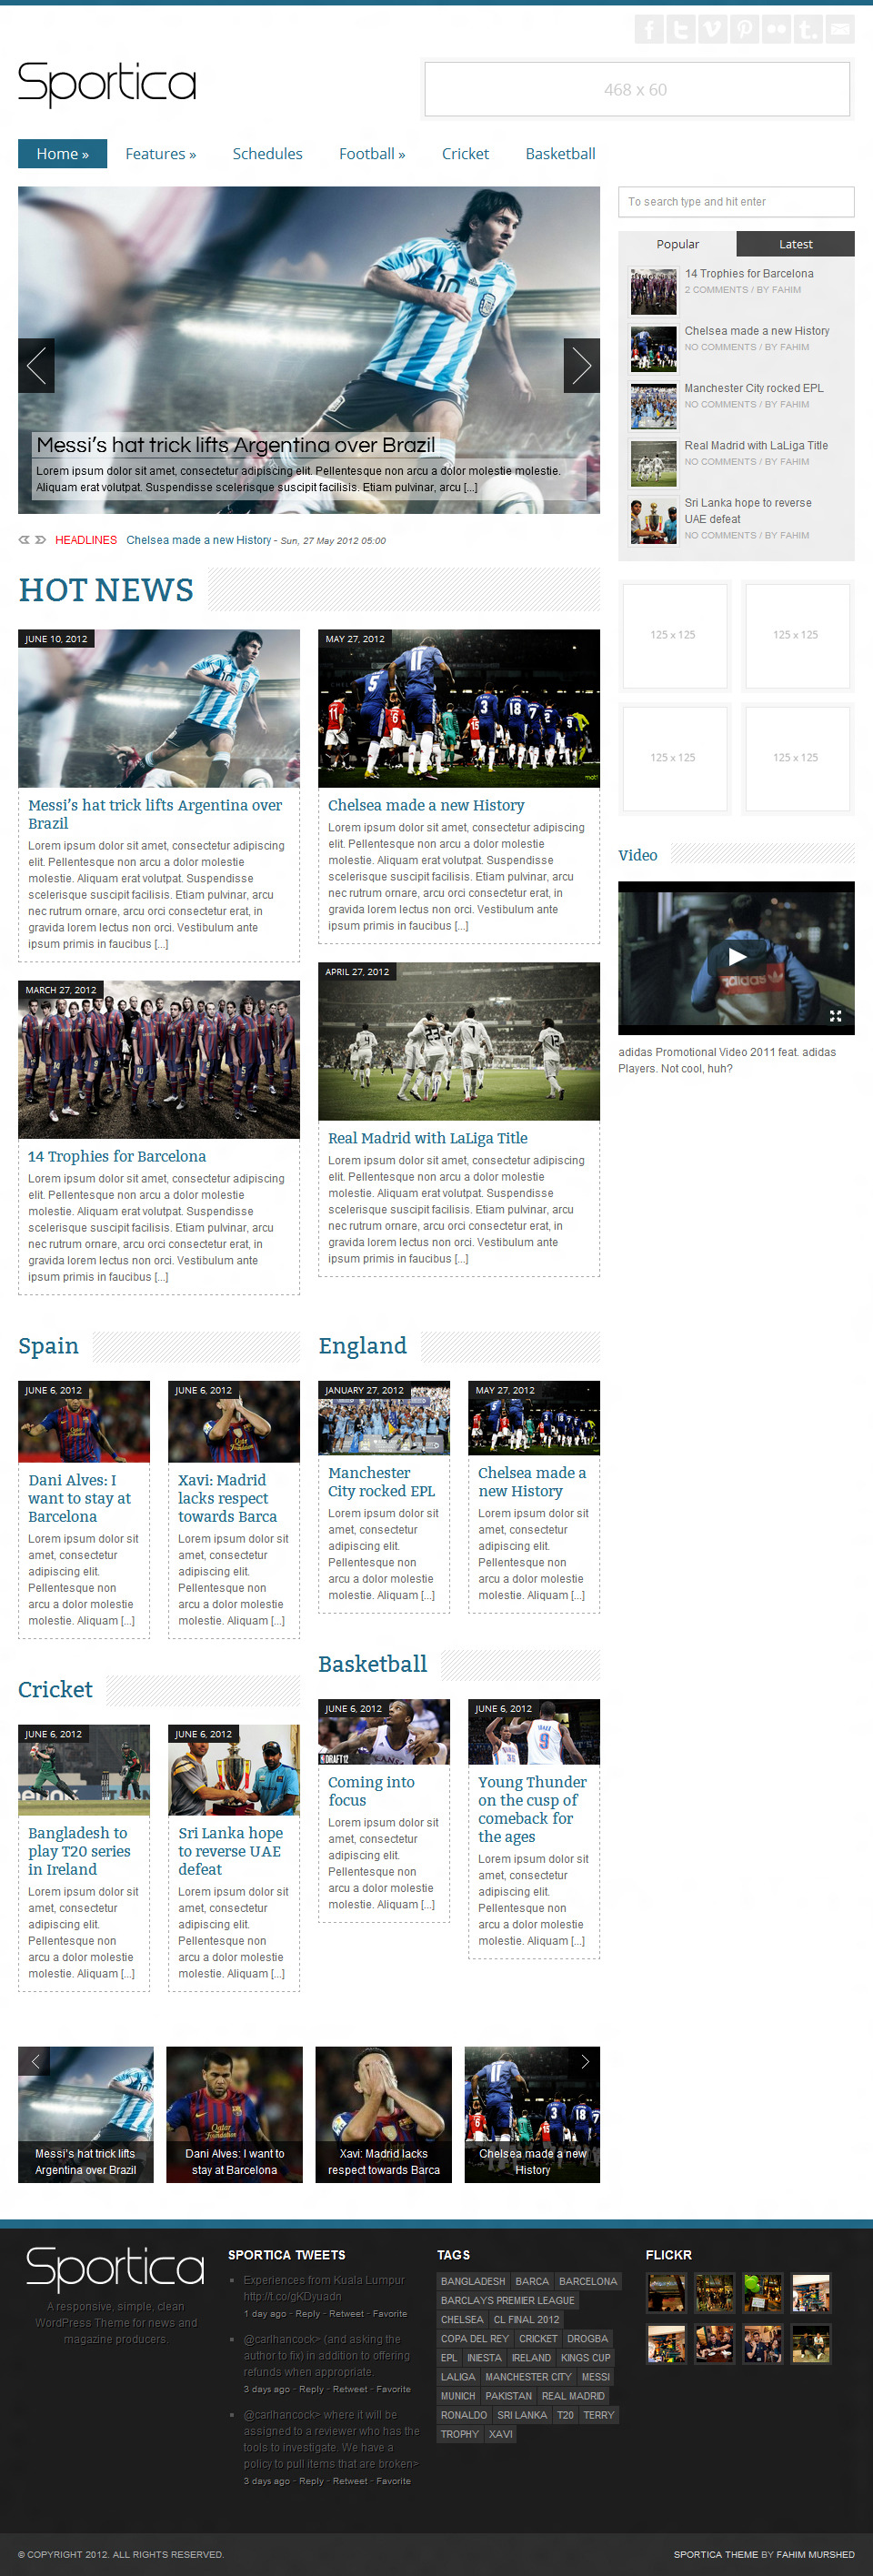 http://3.s3.envato.com/files/49486719/screenshots/02_homepage.jpg